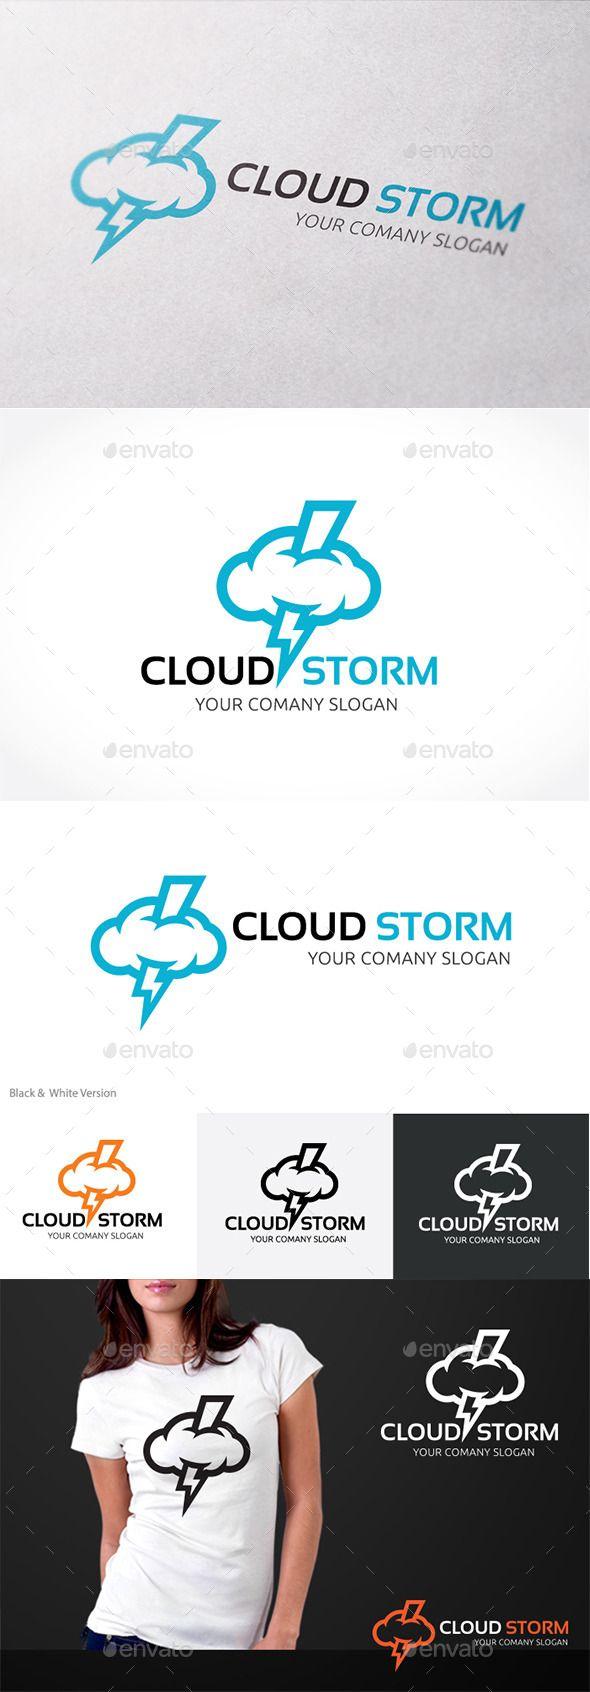 Cloud Storm - Logo Design Template Vector #logotype Download it here: http://graphicriver.net/item/cloud-storm/10658430?s_rank=1172?ref=nexion